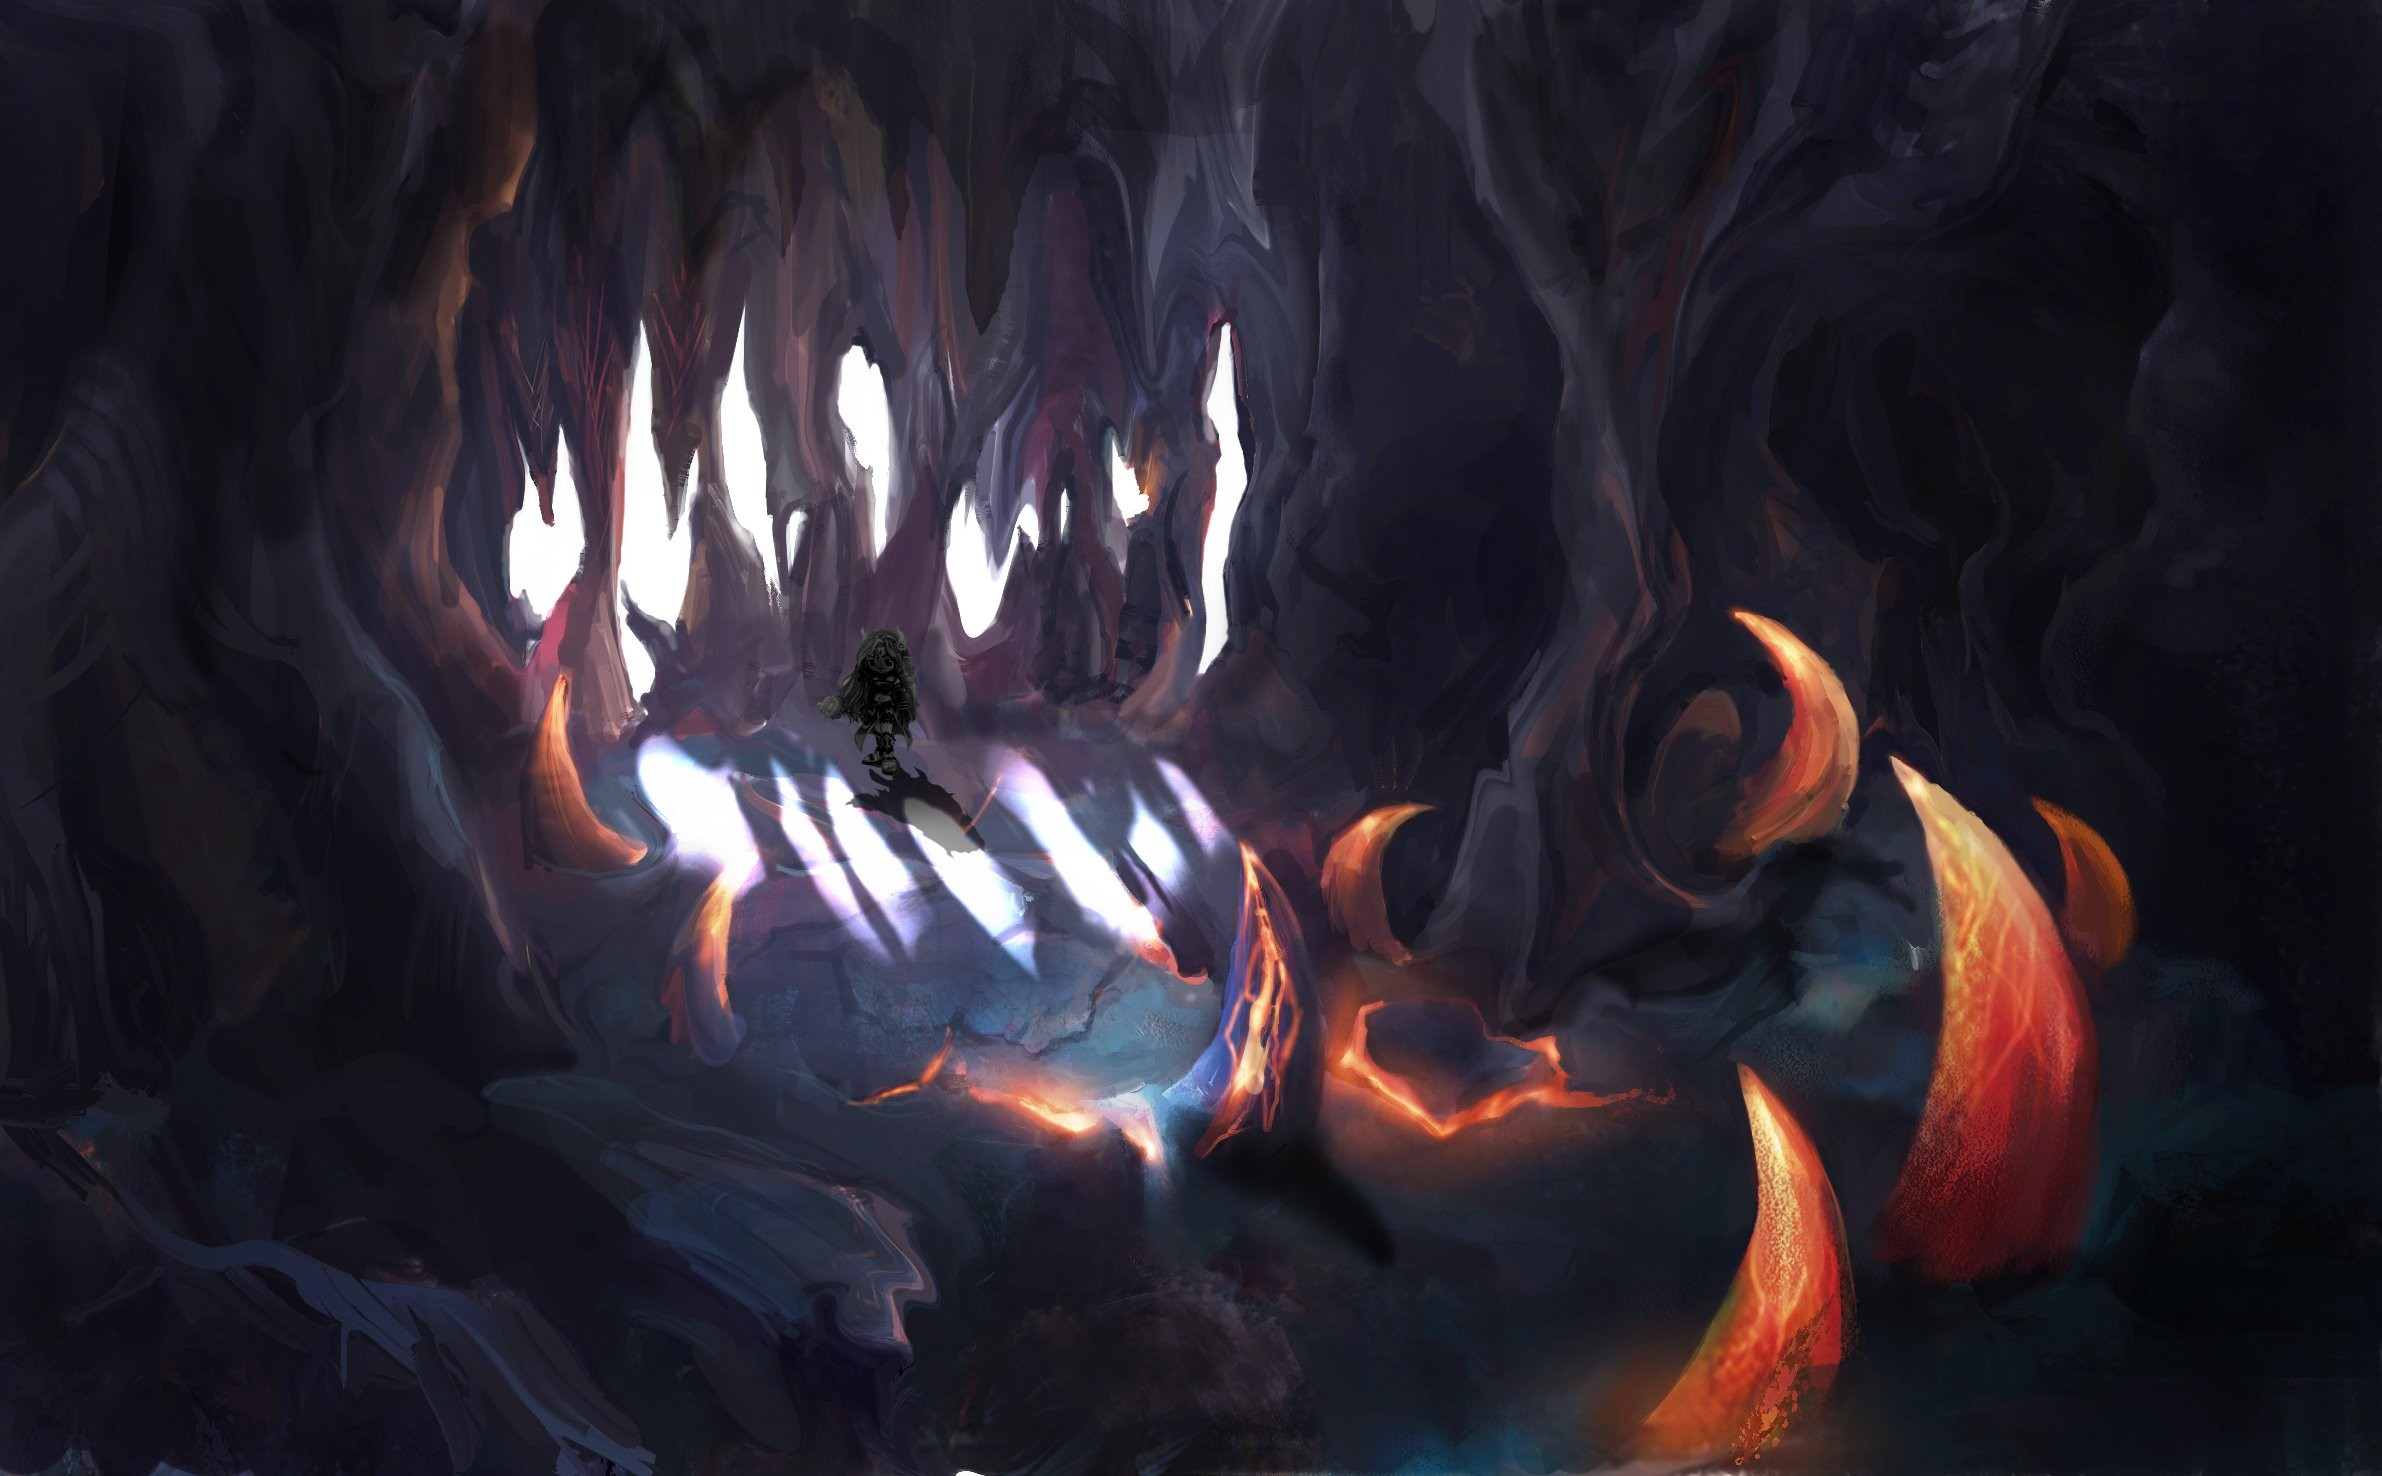 Nostale Online Anime Mmo Rpg Fantasy Adventure 1nosto Action Fighting  Exploration Wallpaper At Dark Wallpapers